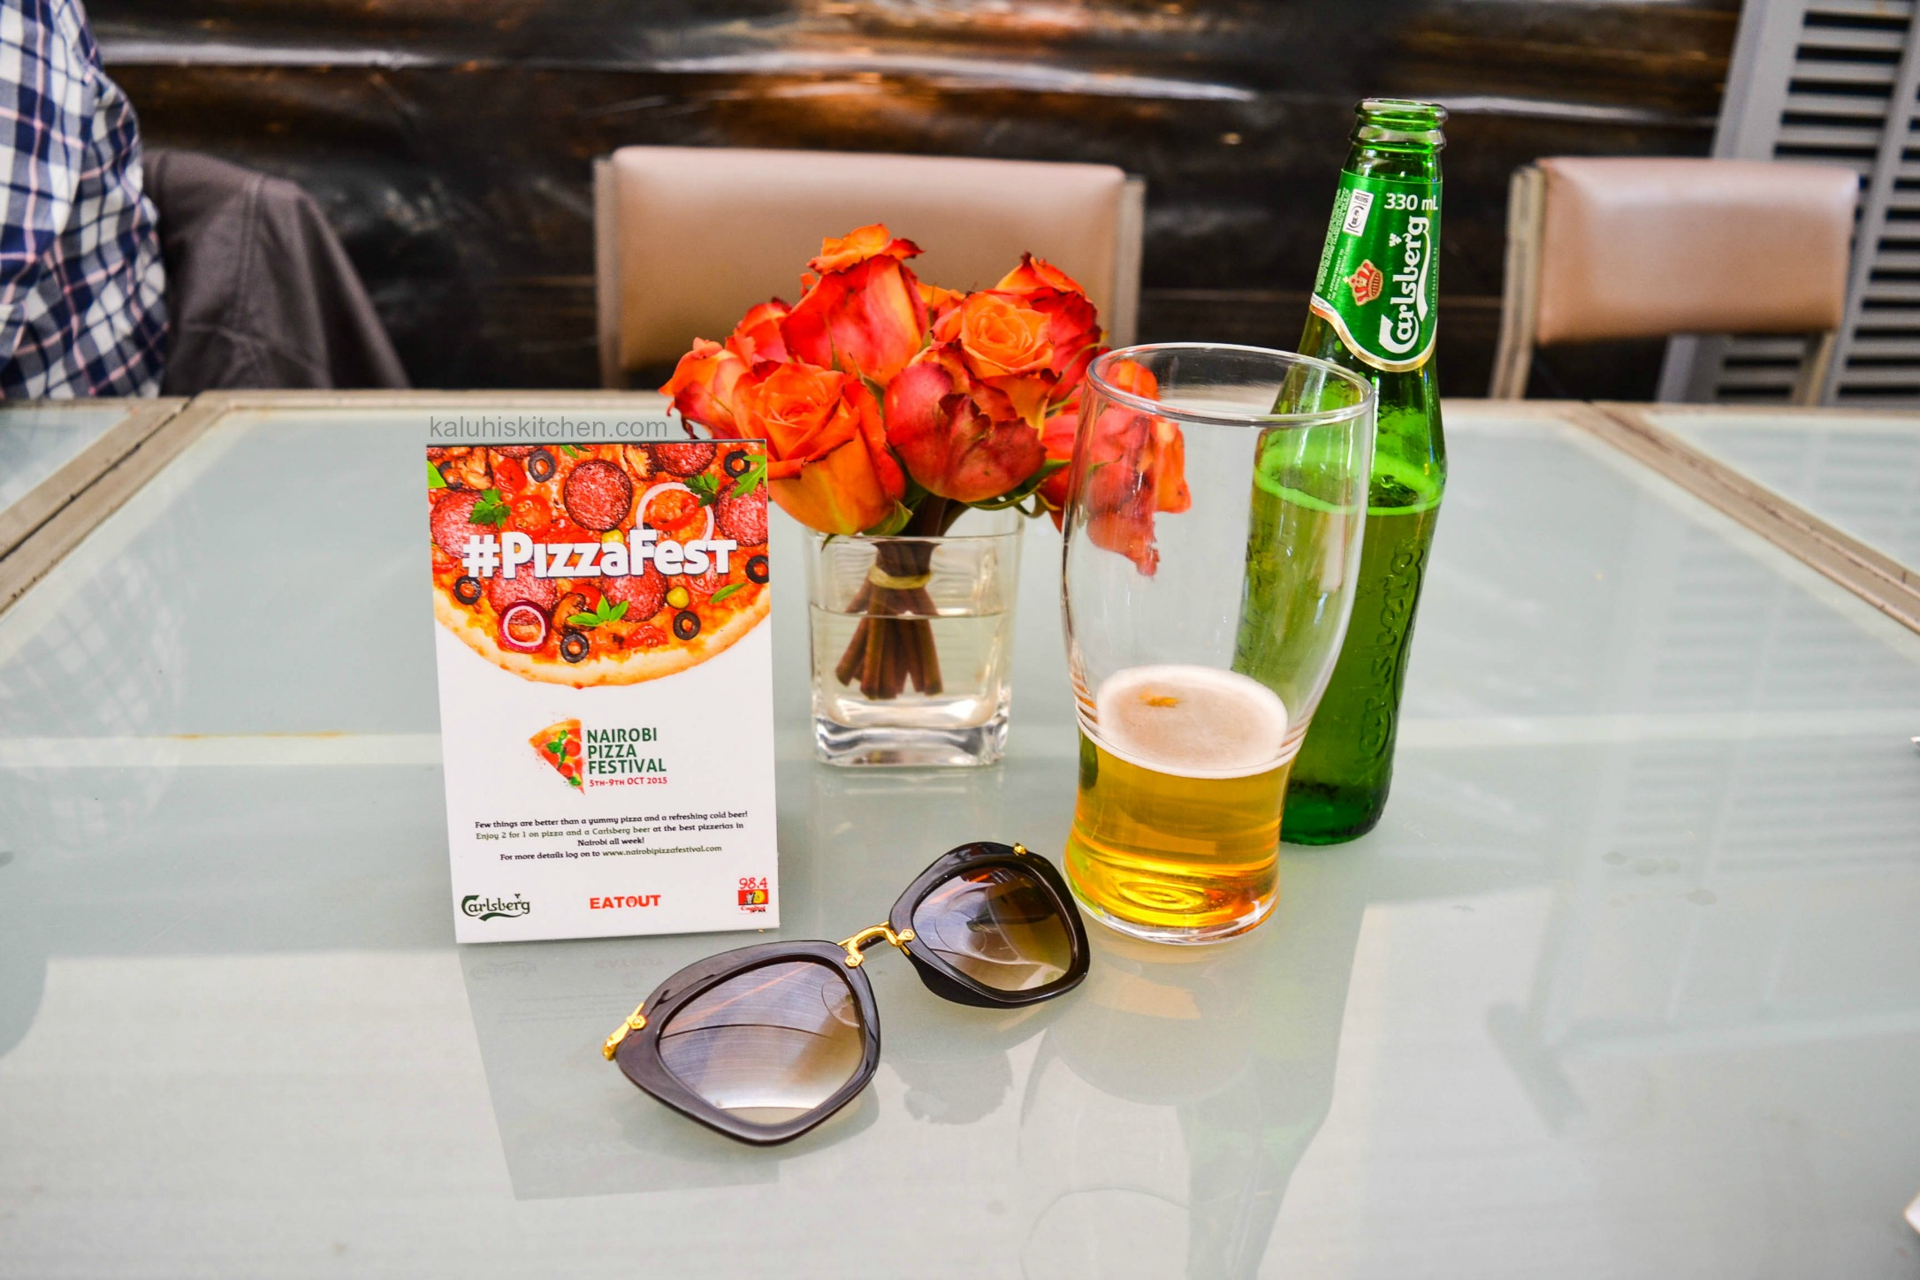 nairobi pizza festival 2015_kaluhiskitchen.com_carlsberg beer